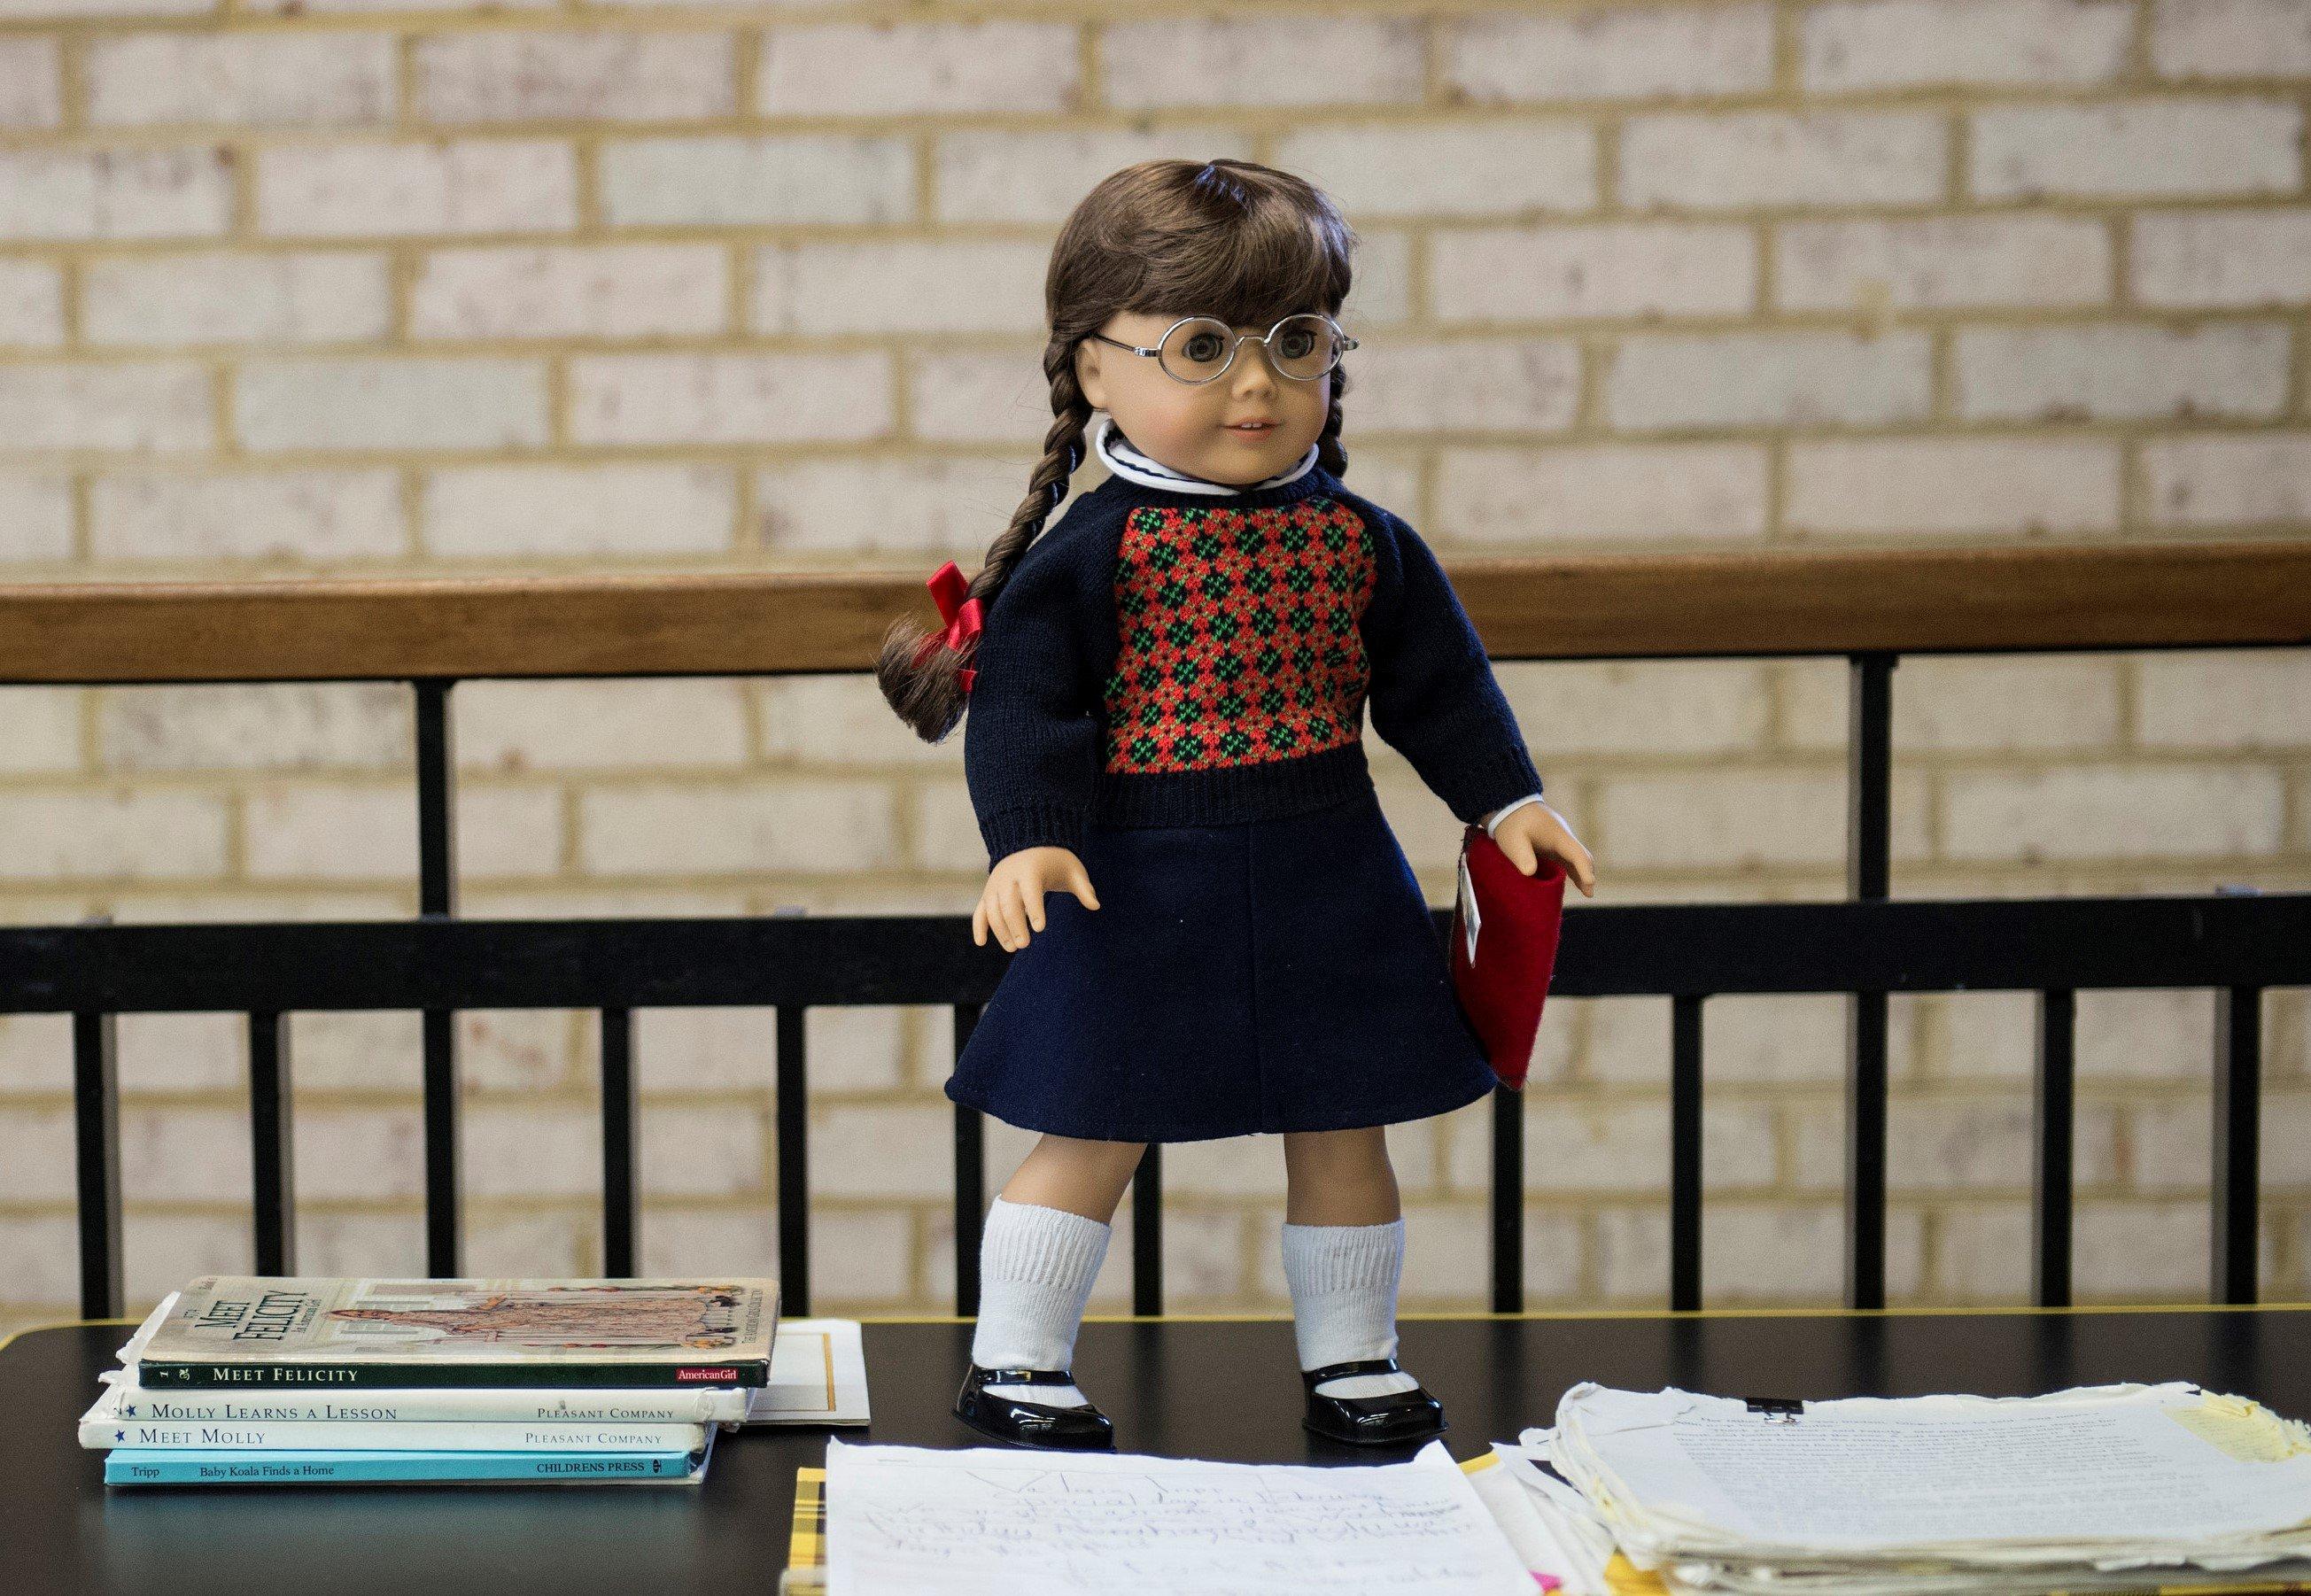 Molly American Girl doll